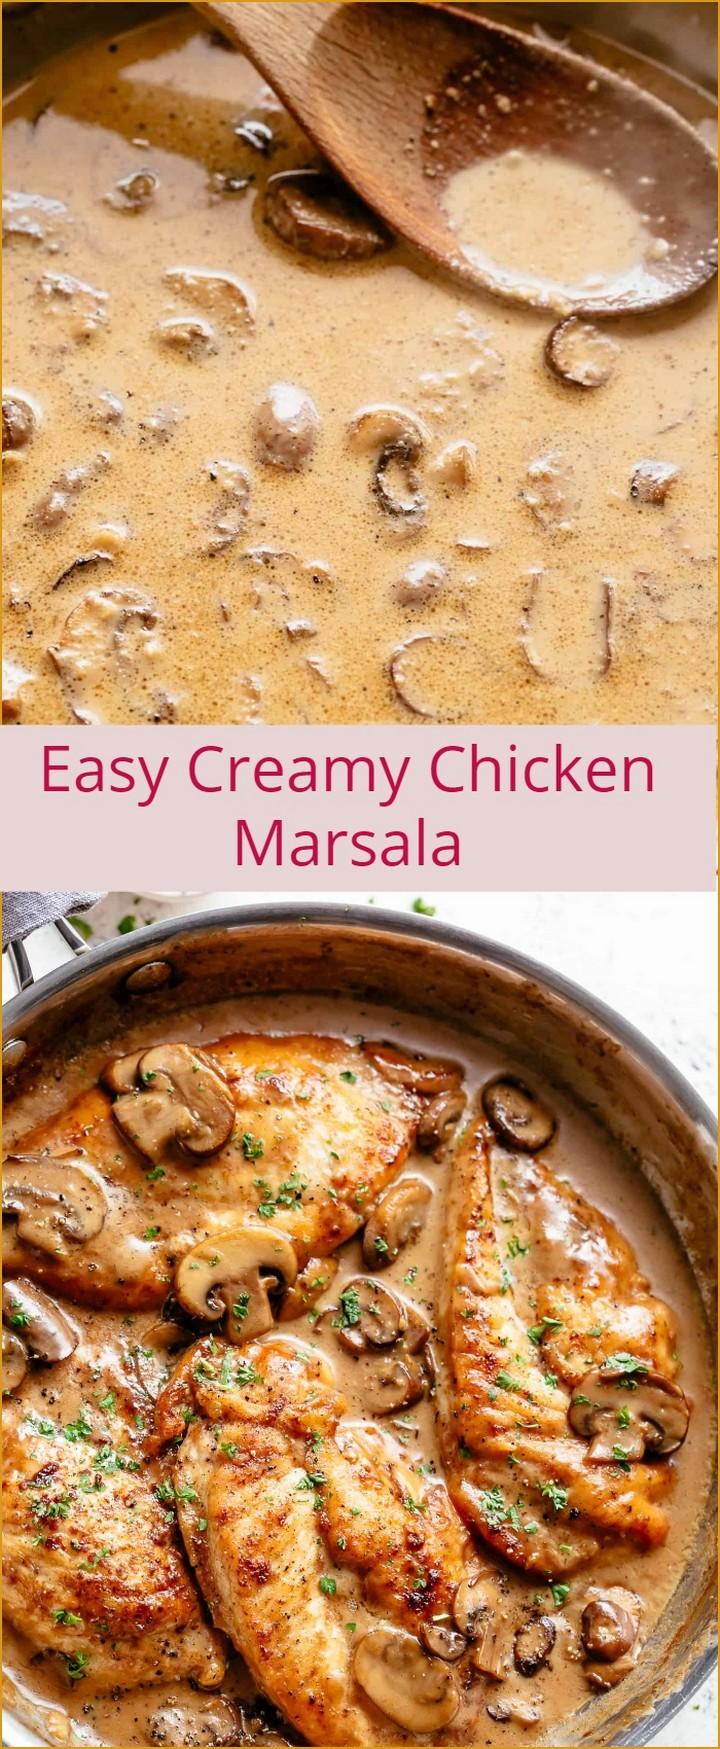 Easy Creamy Chicken Marsala 1 1